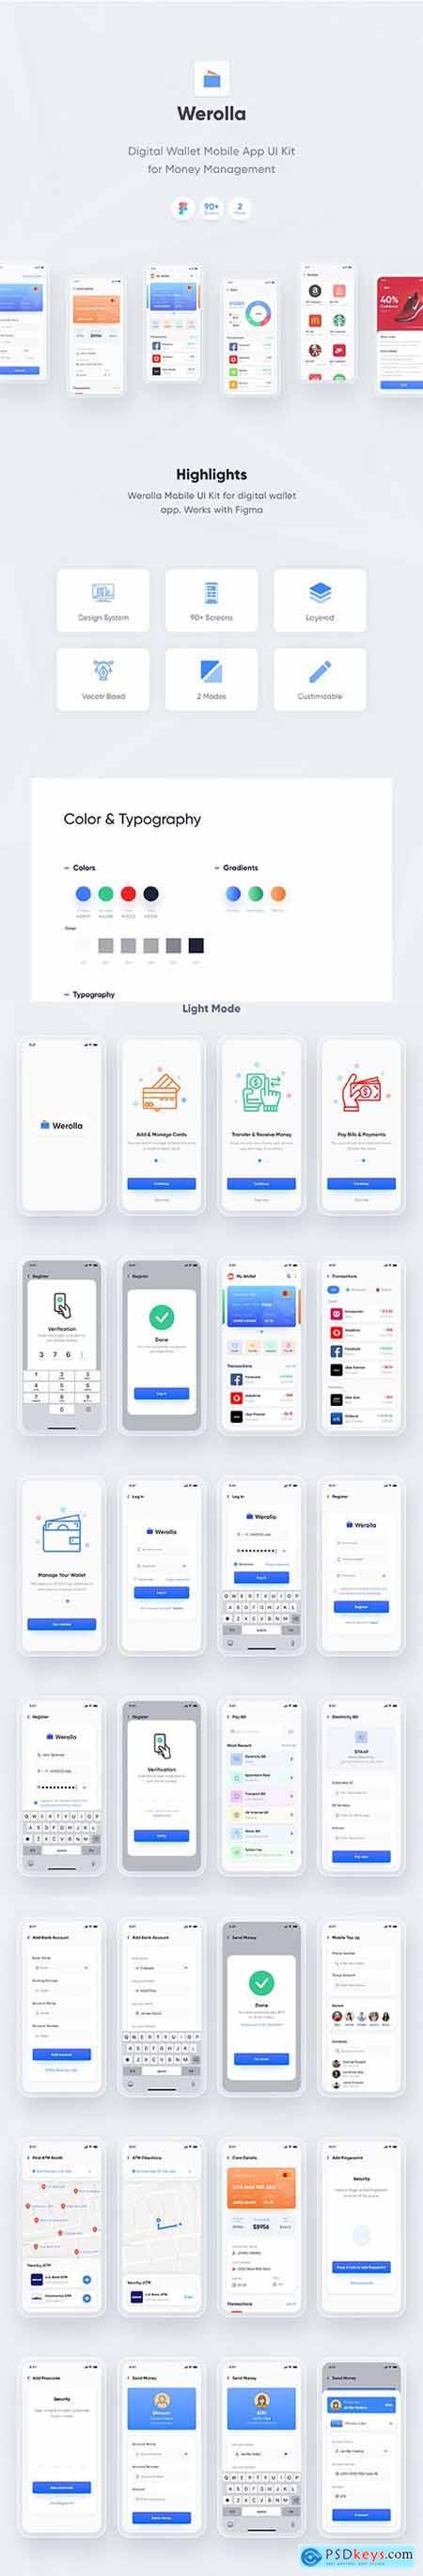 Werolla - Mobile App UI Kit for Wallet, Finance & Banking App